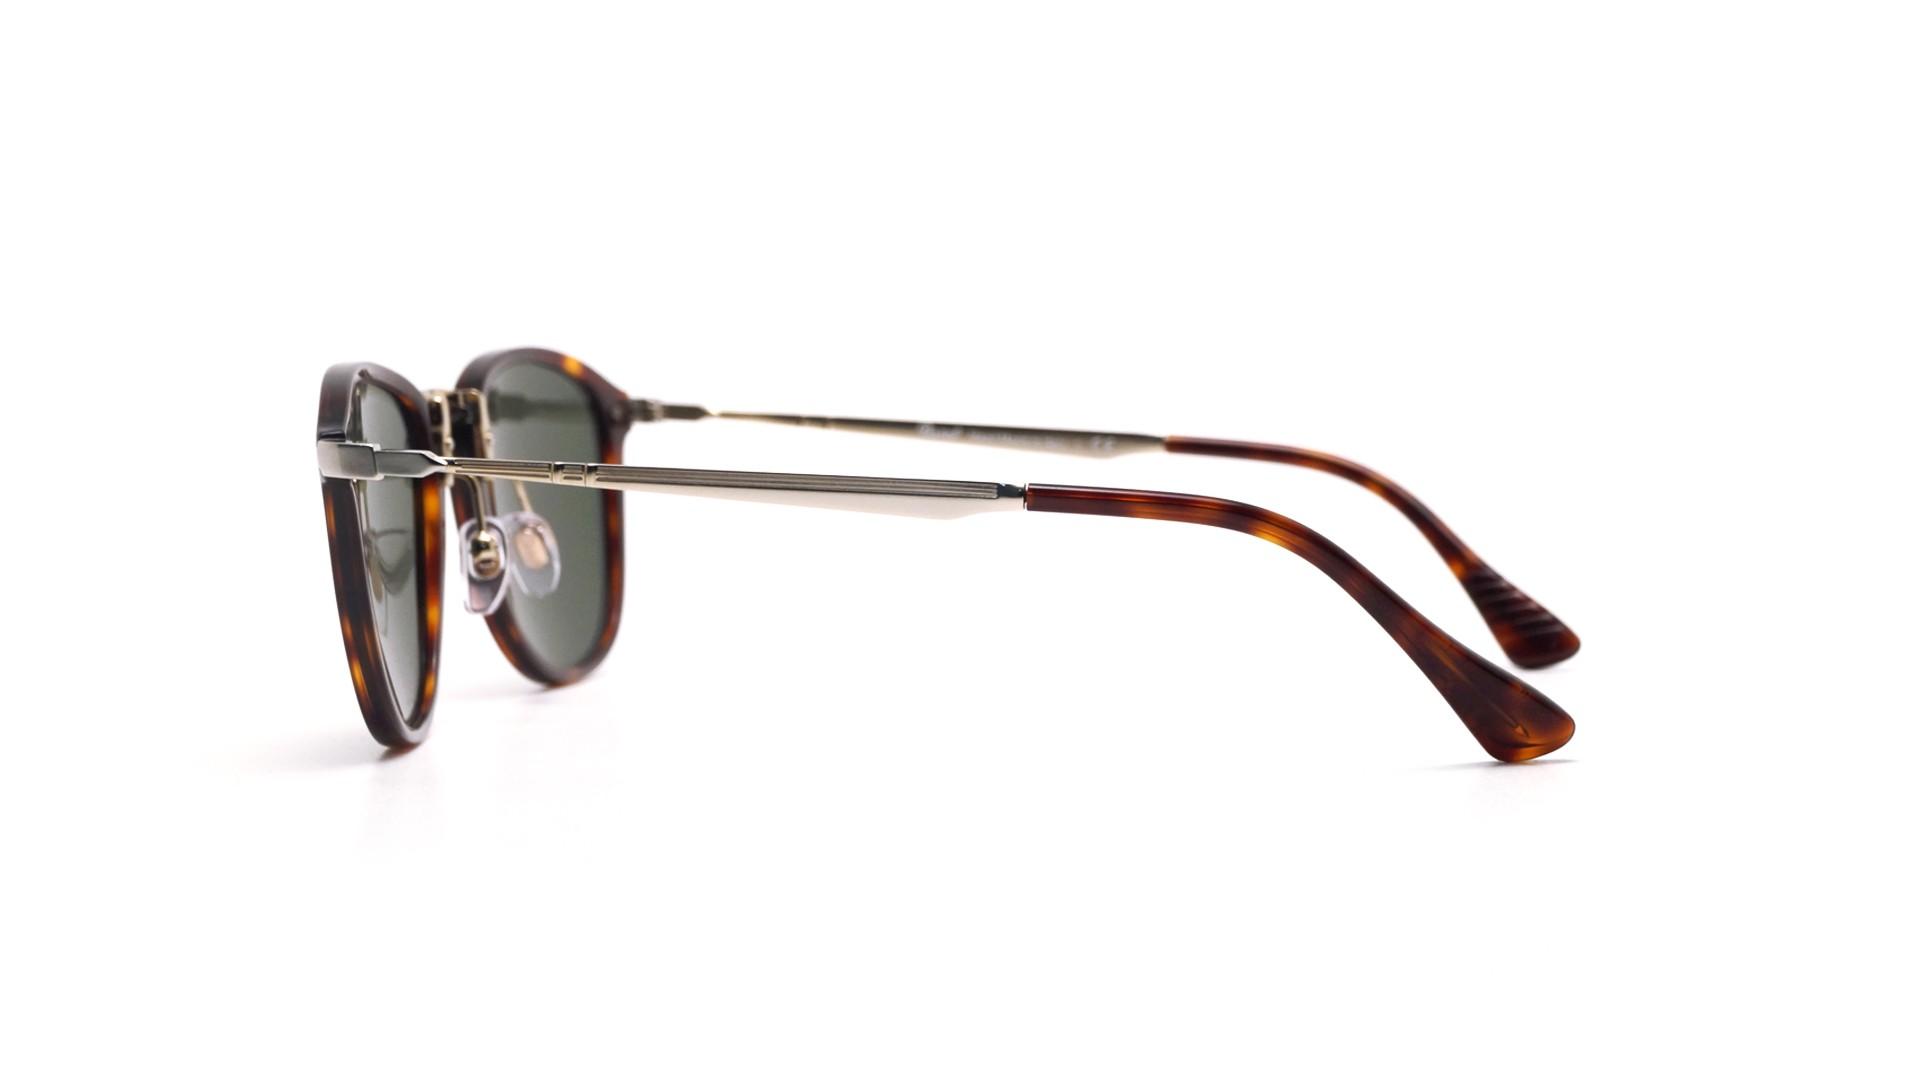 77ab6e6250 Sunglasses Persol Calligrapher edition Havana Tortoise PO3165S 24 31 52-22  Large